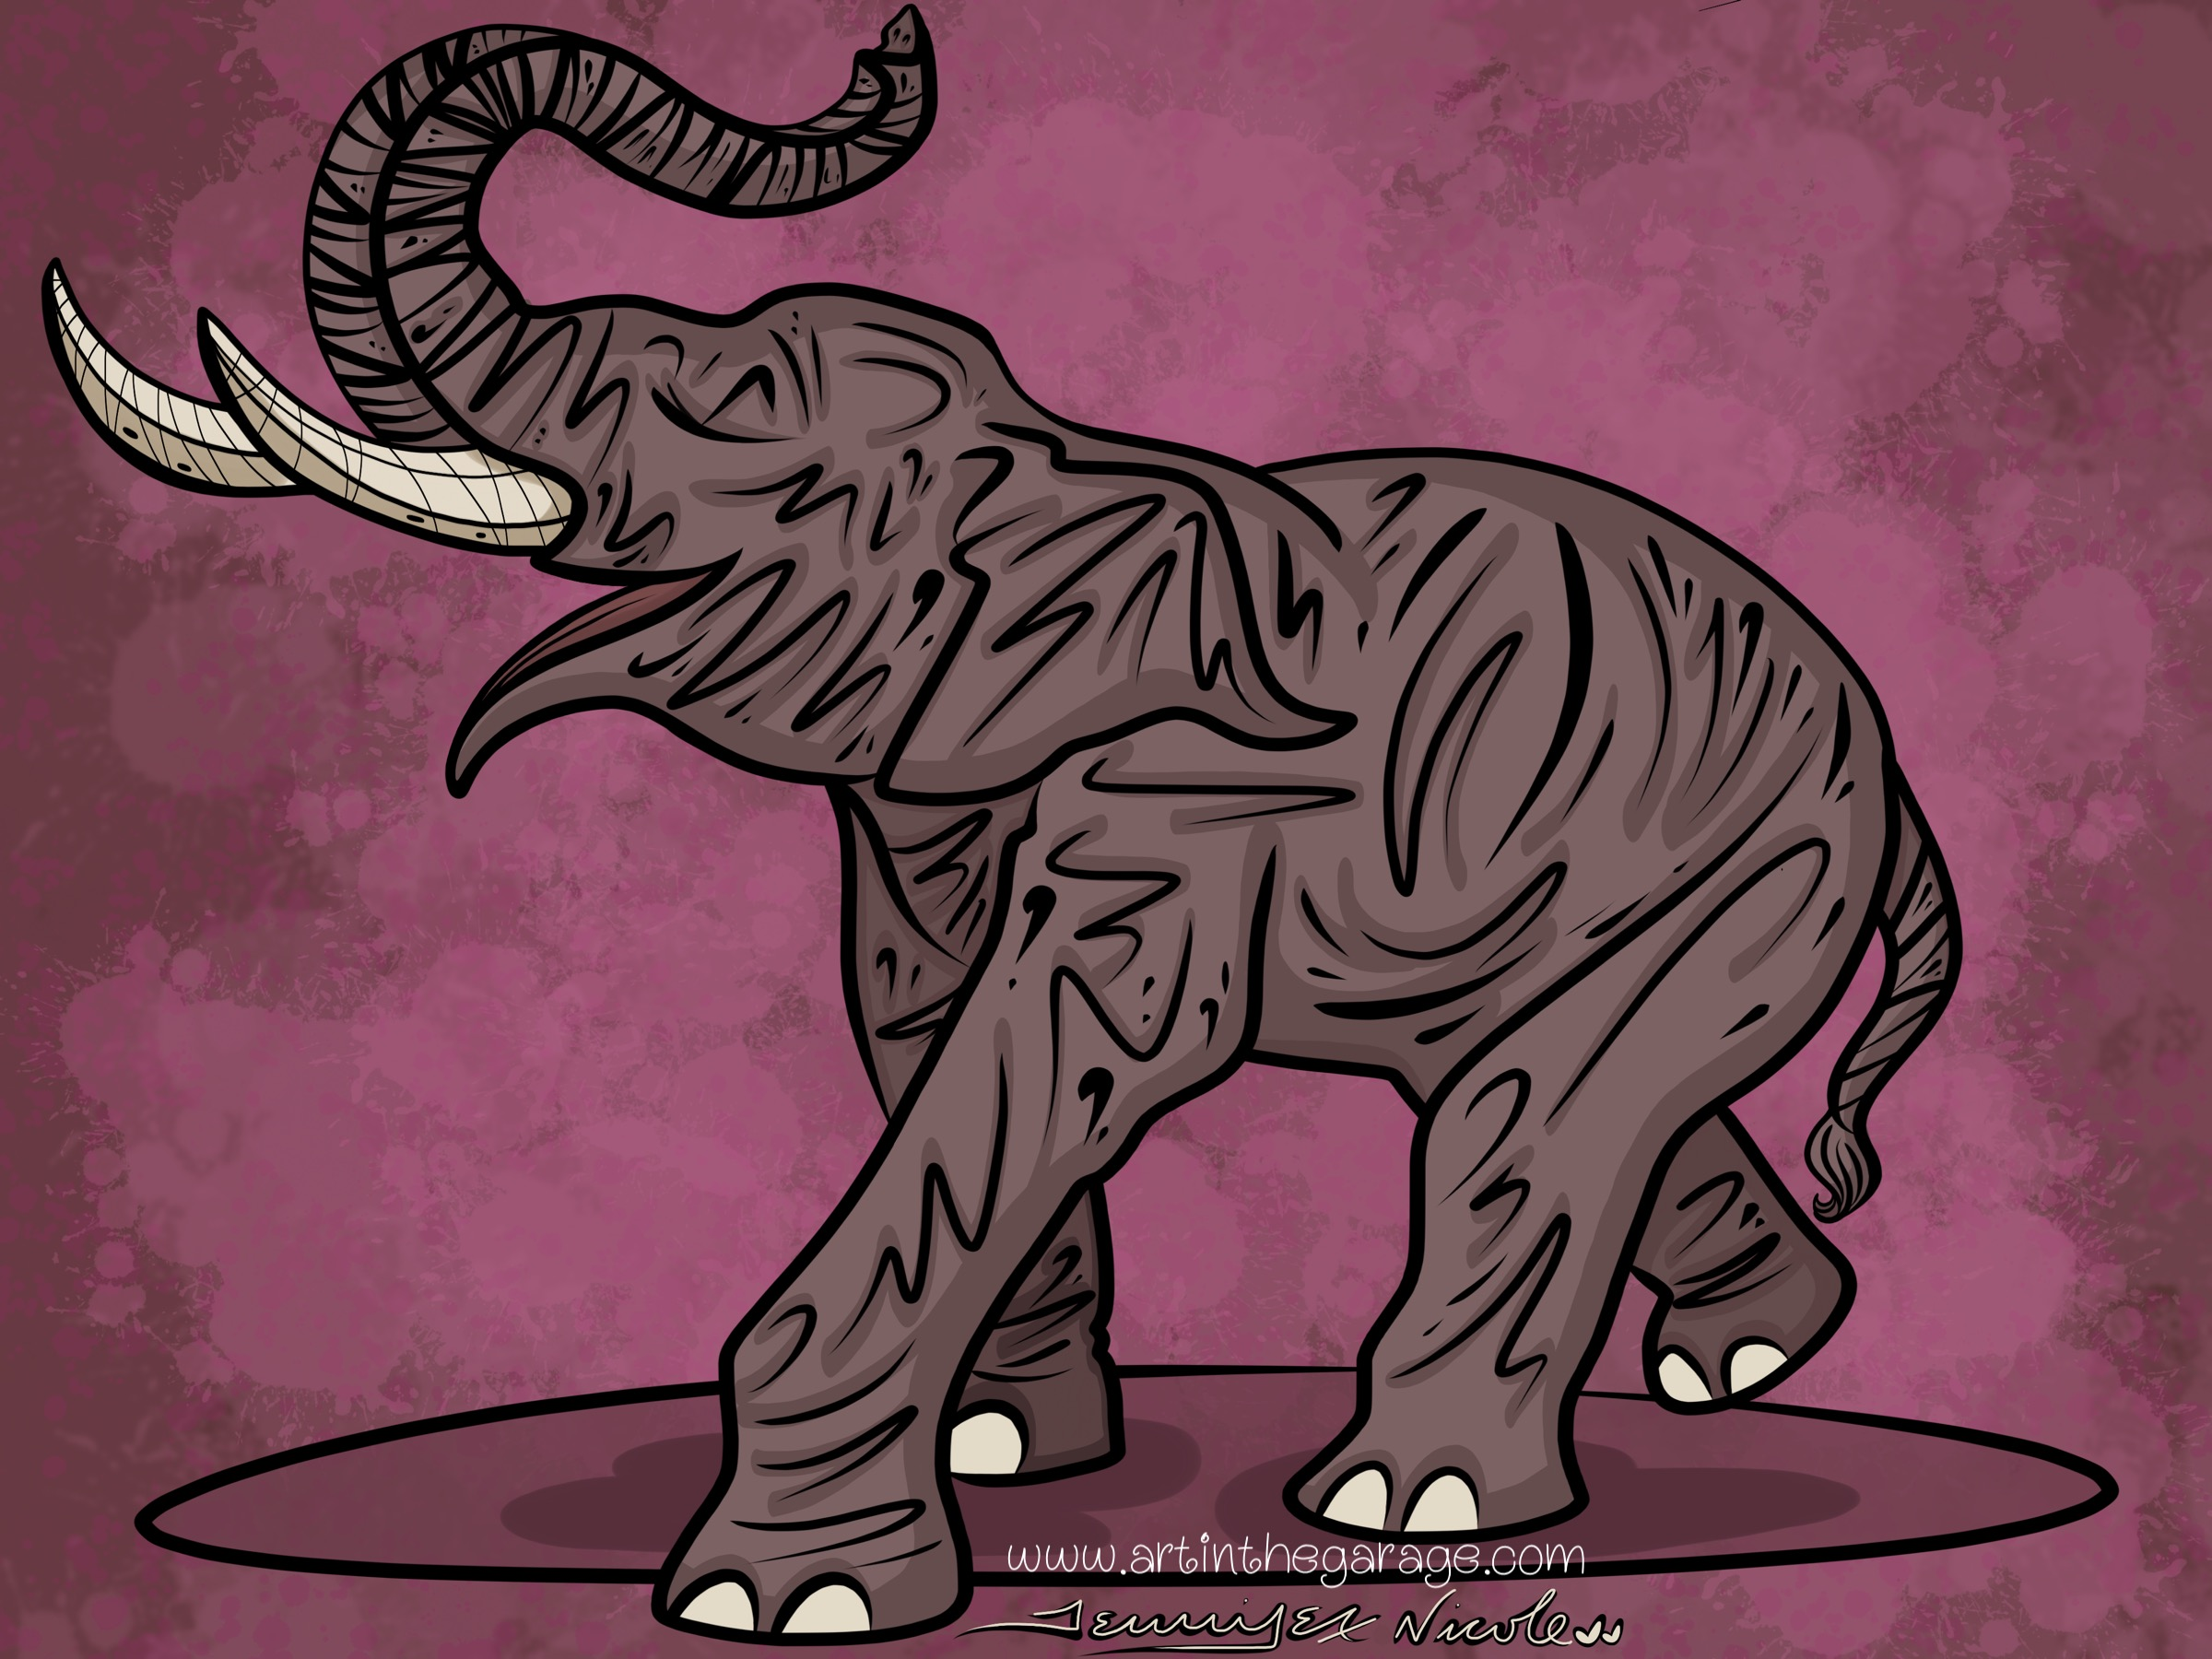 7-13-15 Elephants Are Fun